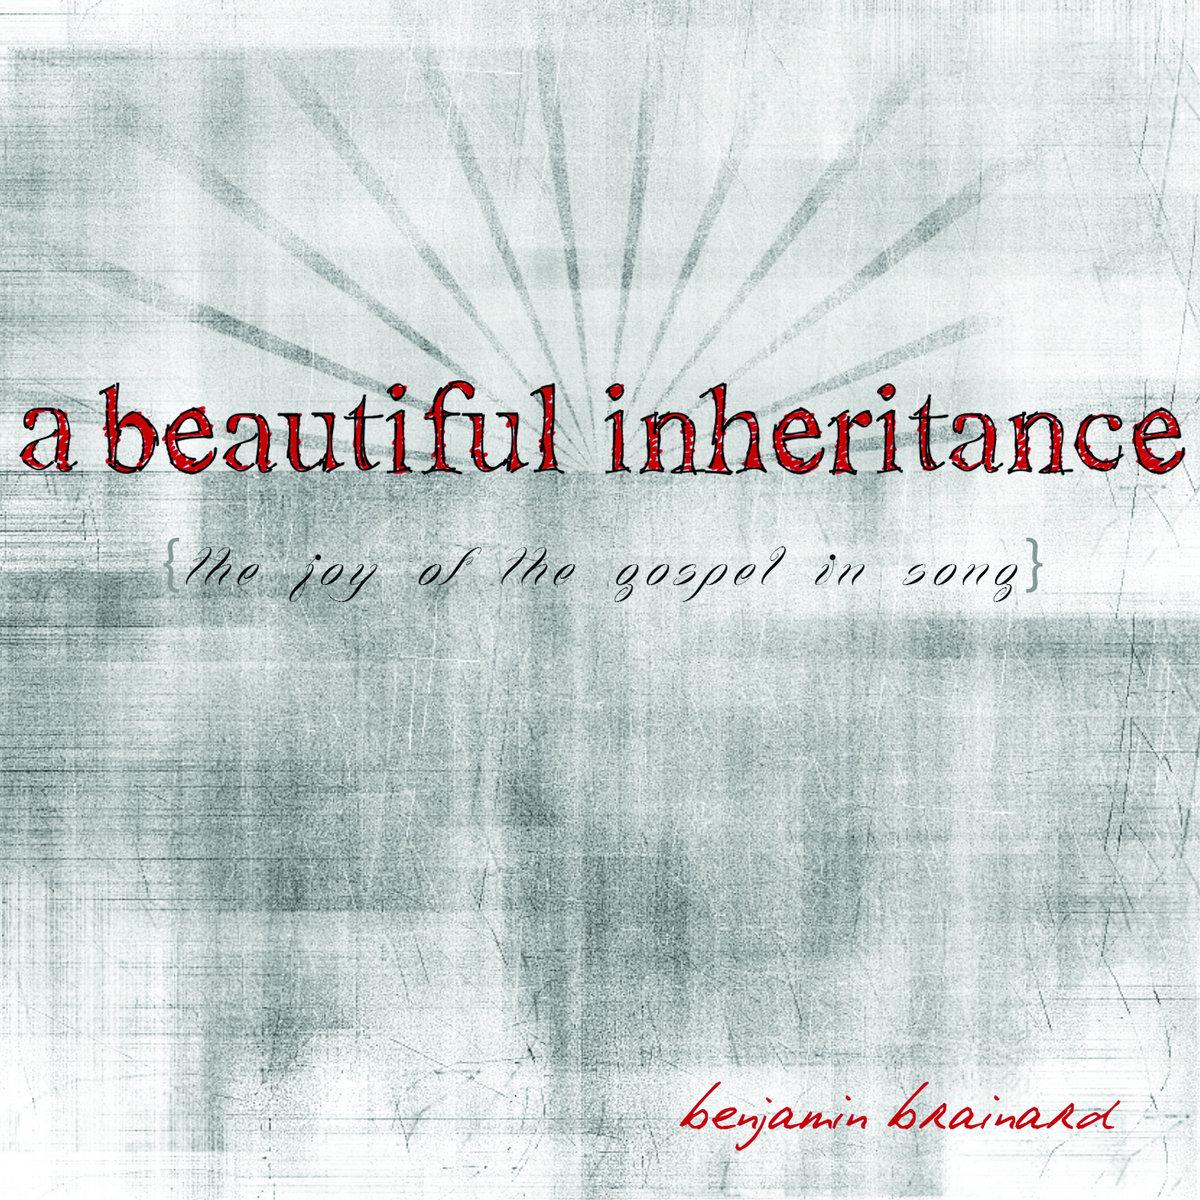 A beautiful inheritance benjamin brainard by benjamin brainard hexwebz Image collections